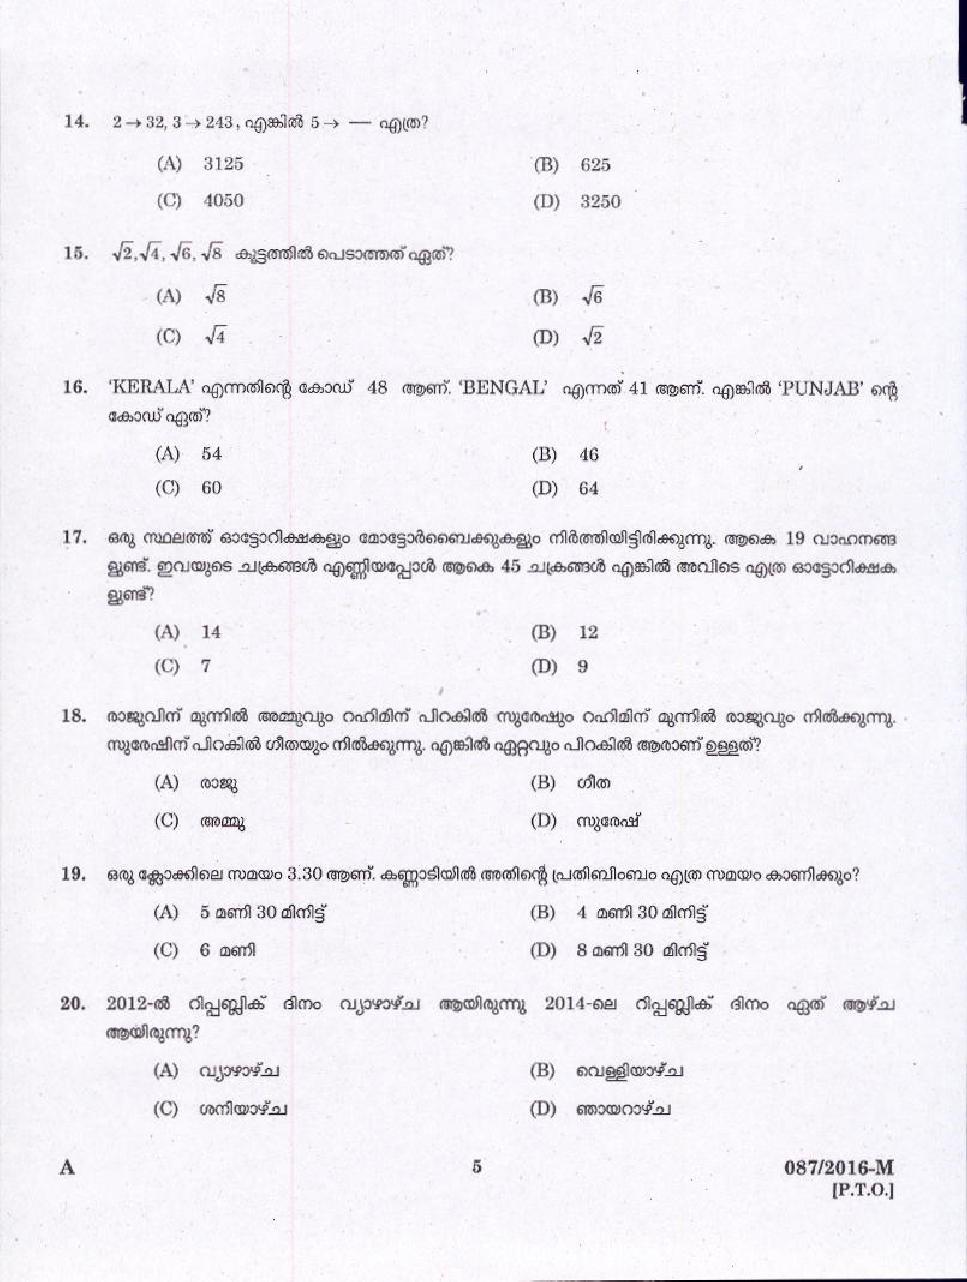 http://masterstudy.net//pdf/psc/village-extension-officer-gr-ii-rural-development/q_0872016-m0003.jpg